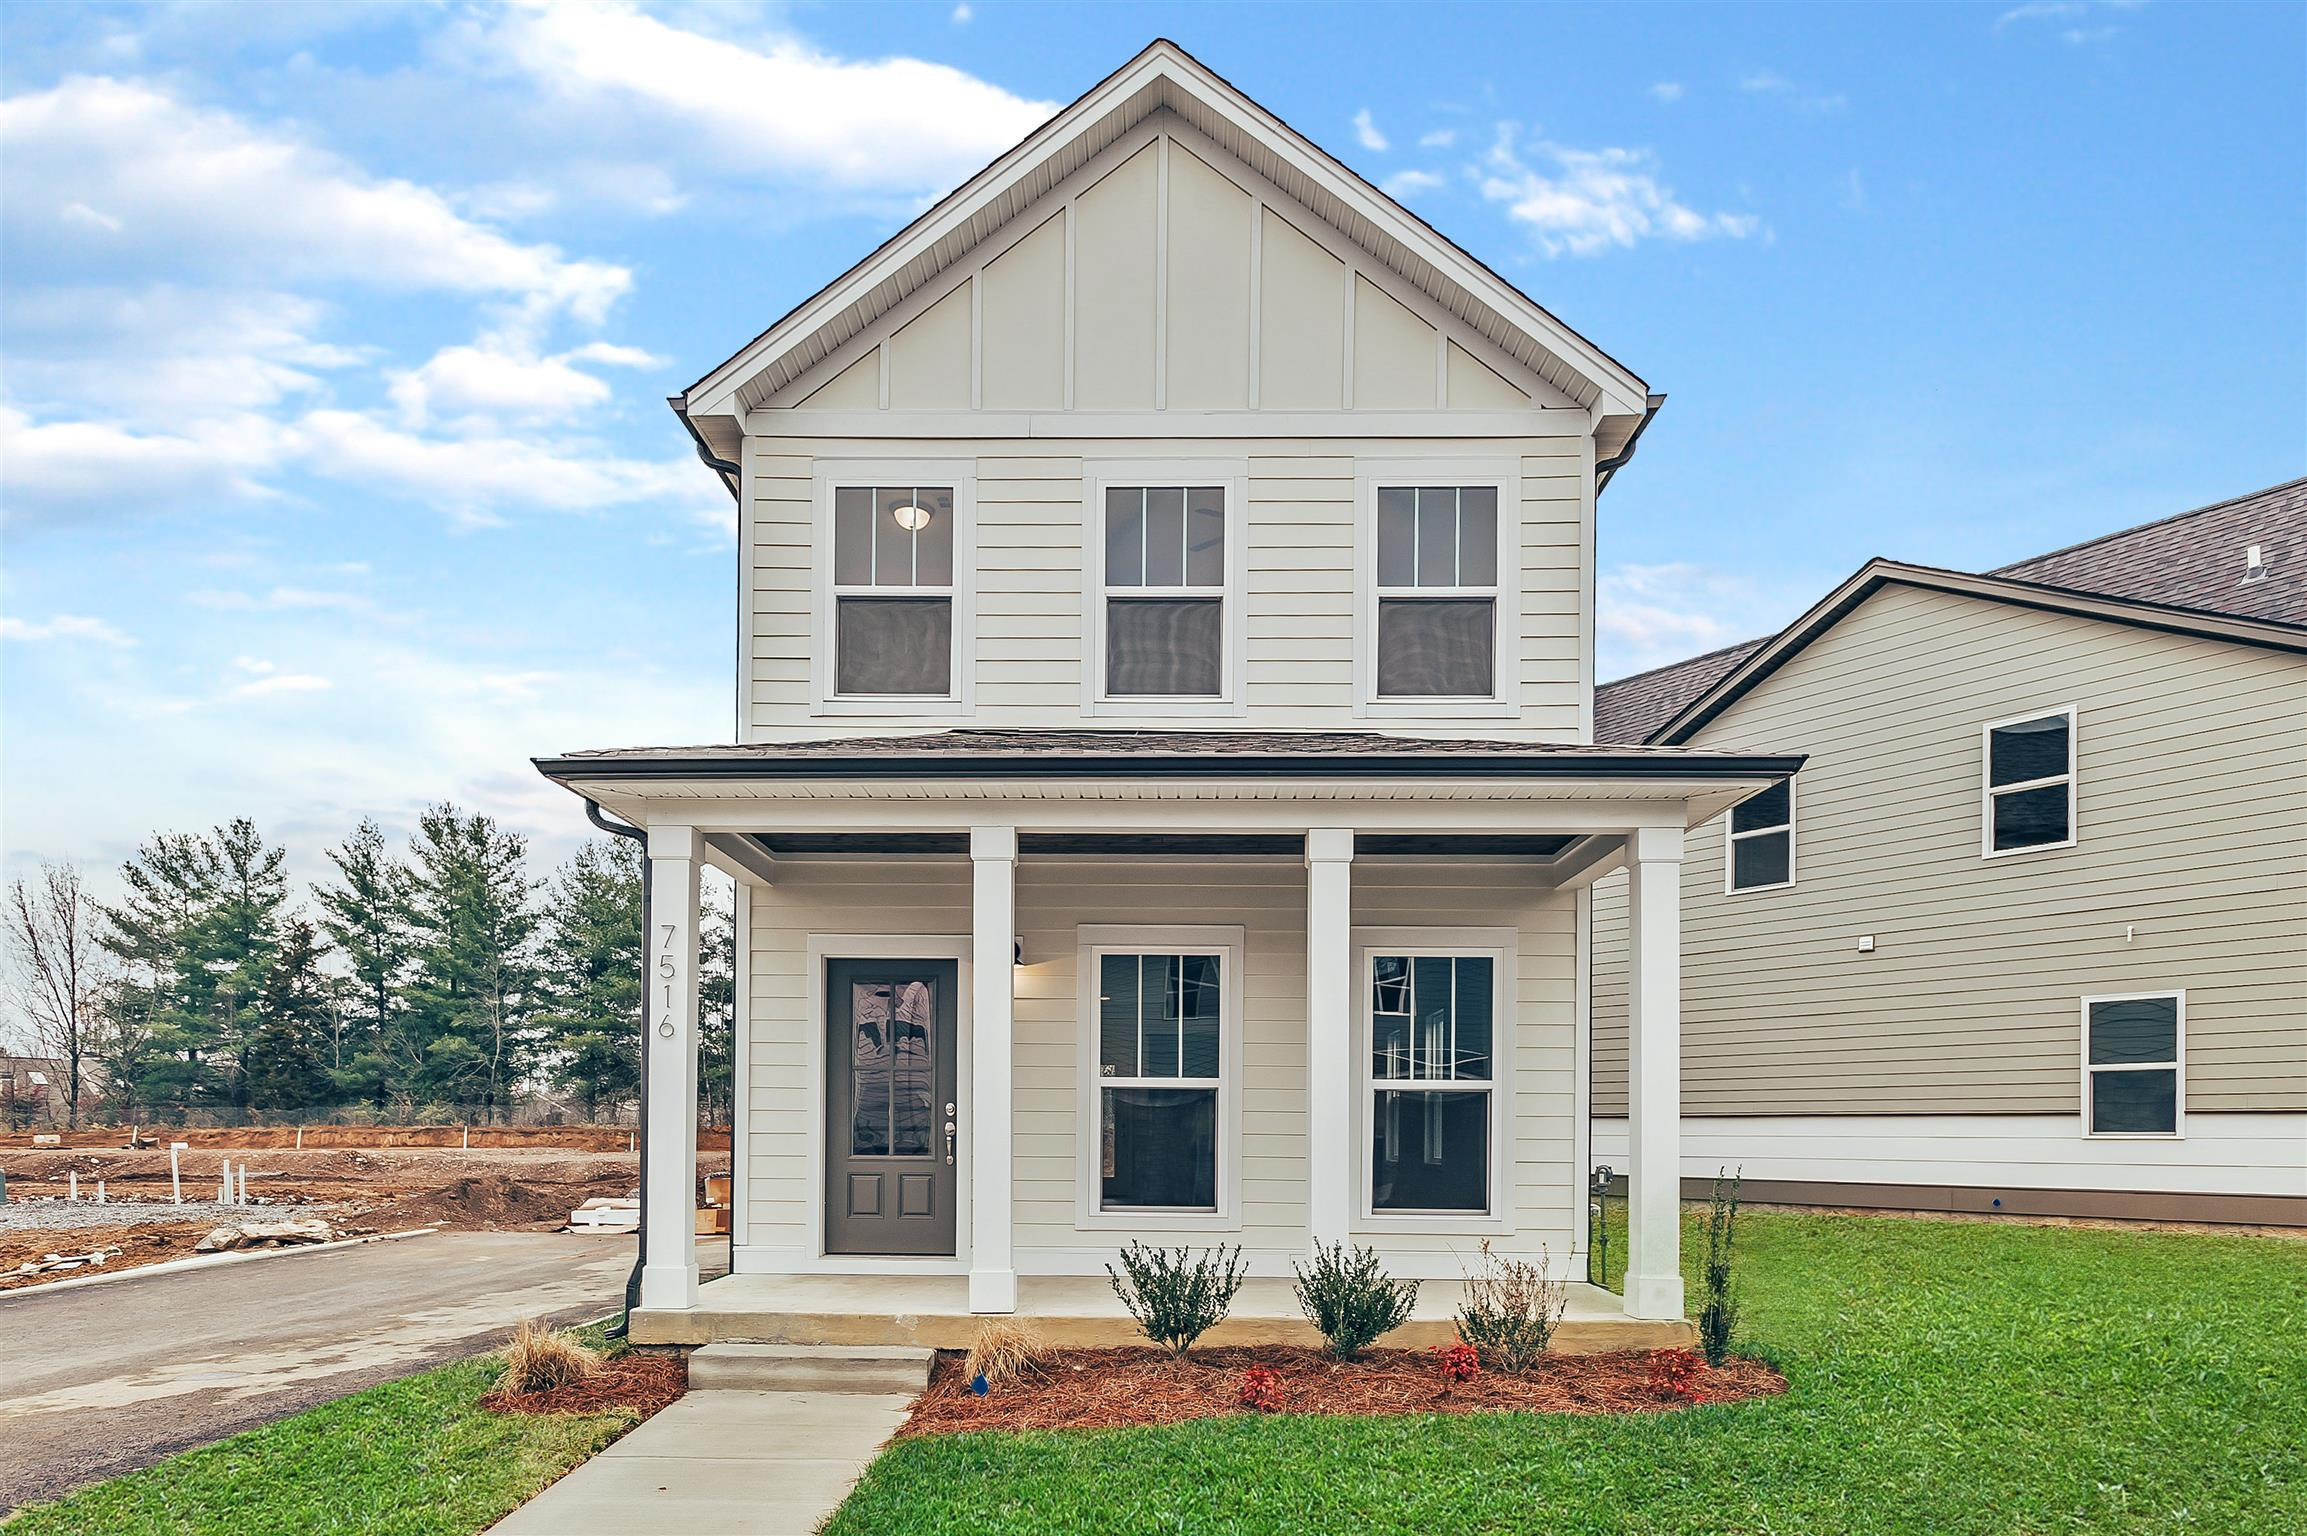 2504 Napa Valley Way, Columbia, TN 38401 - Columbia, TN real estate listing